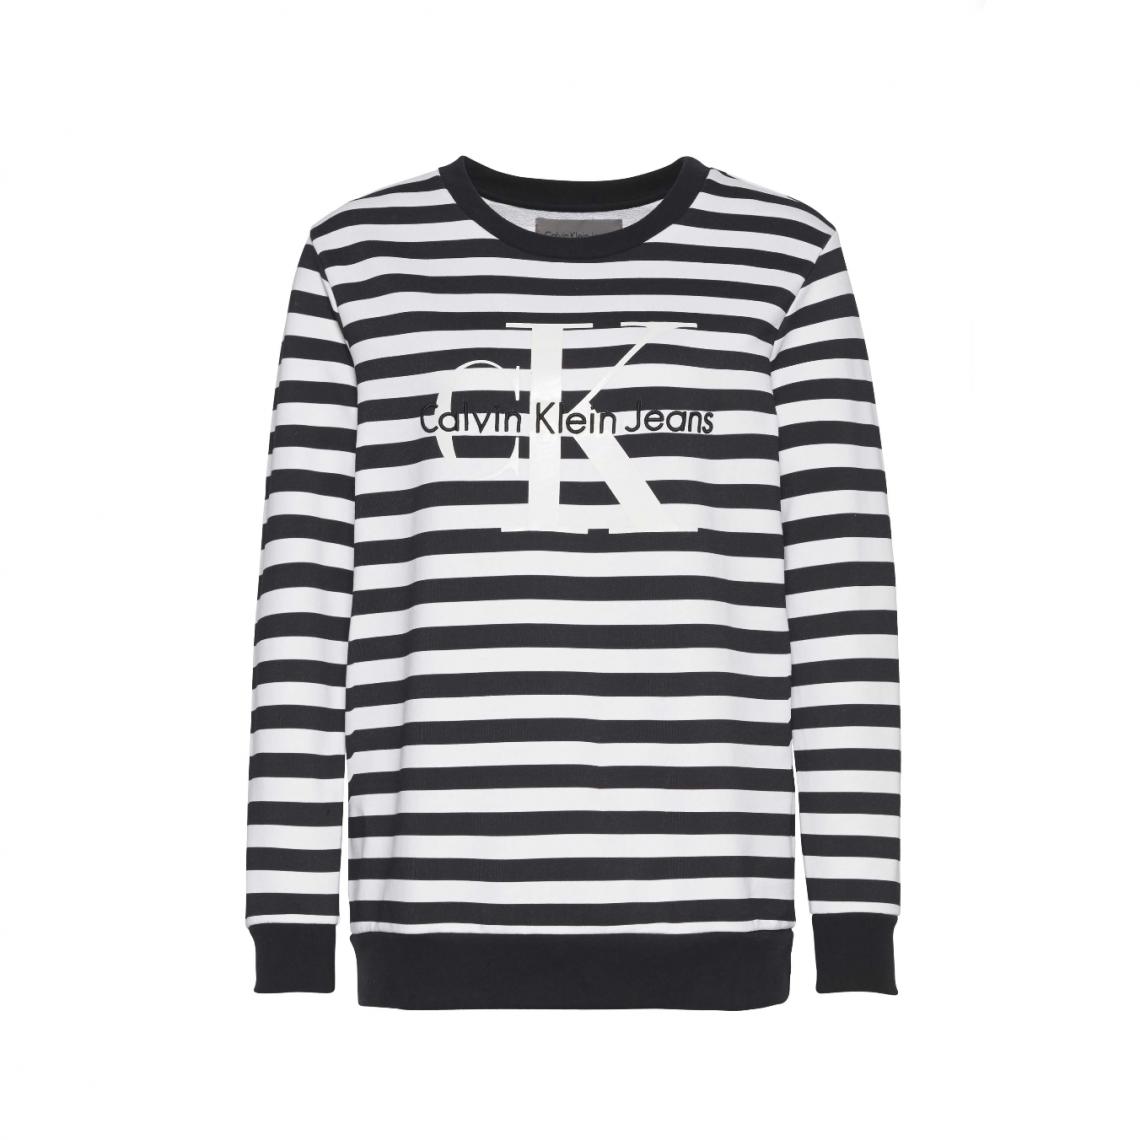 best deals on sale usa online finest selection Sweat rayé col rond femme Calvin Klein - Blanc - Noir